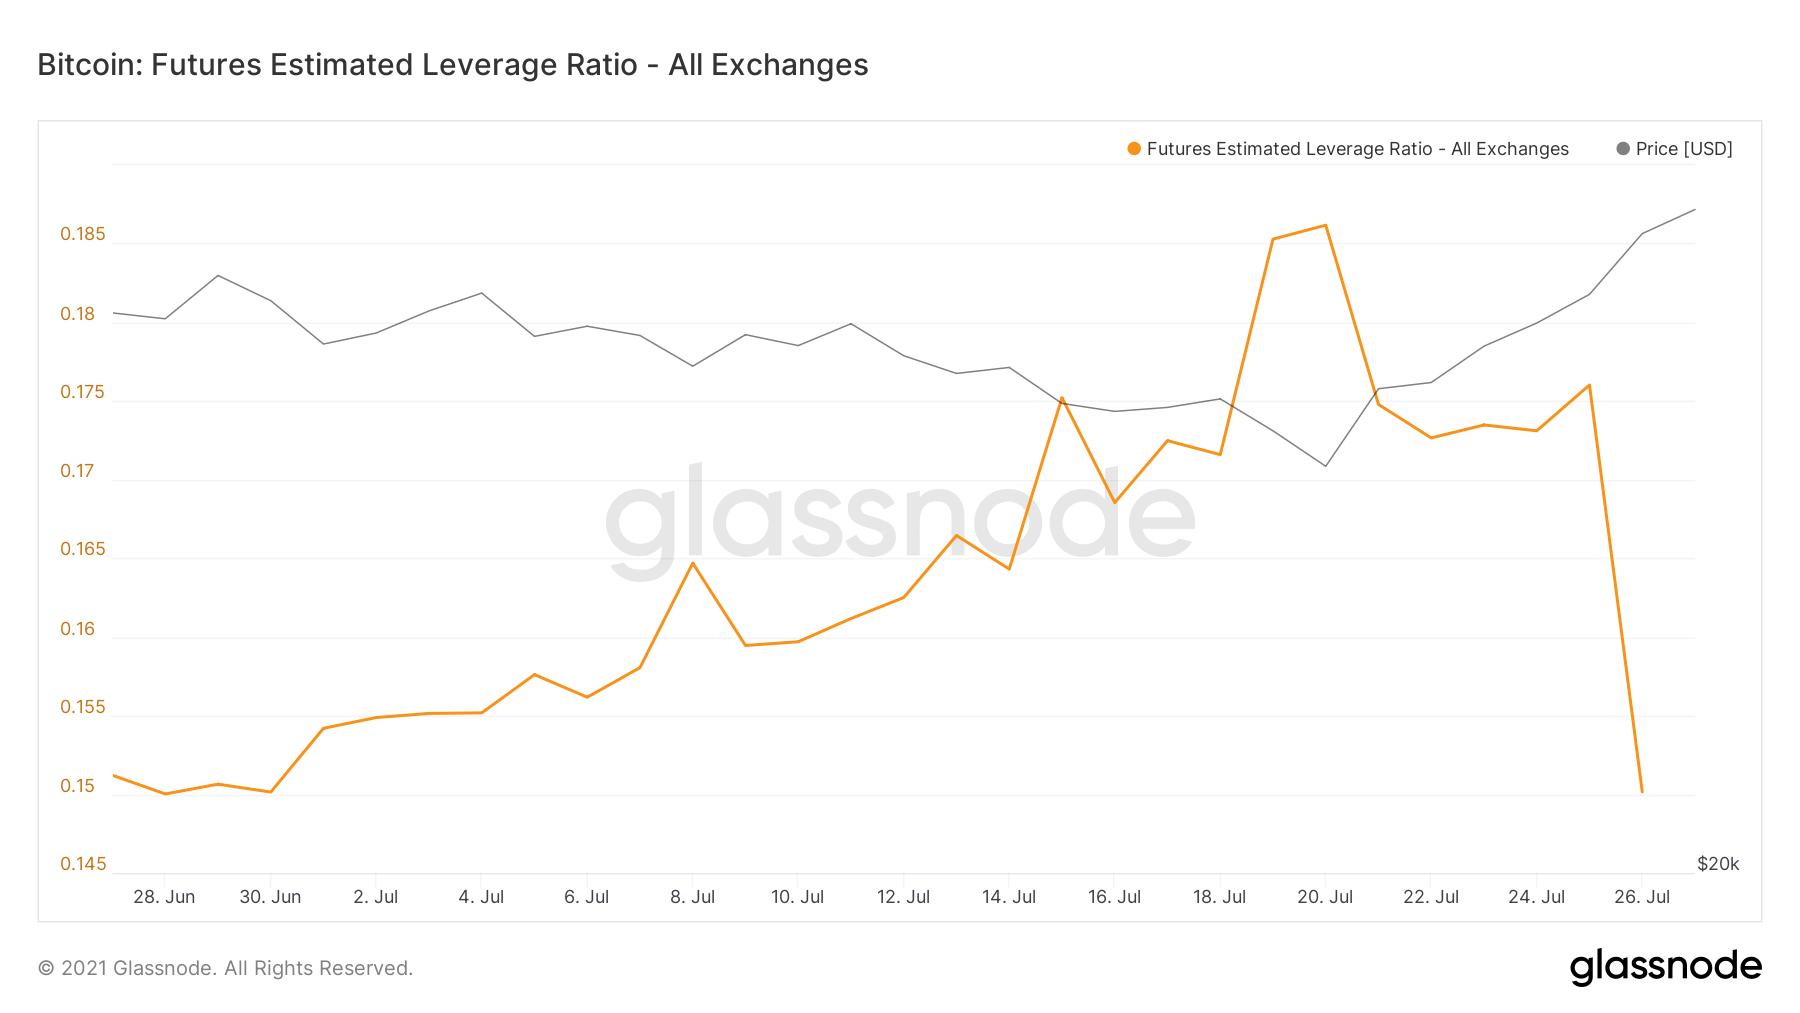 Leverage ratio